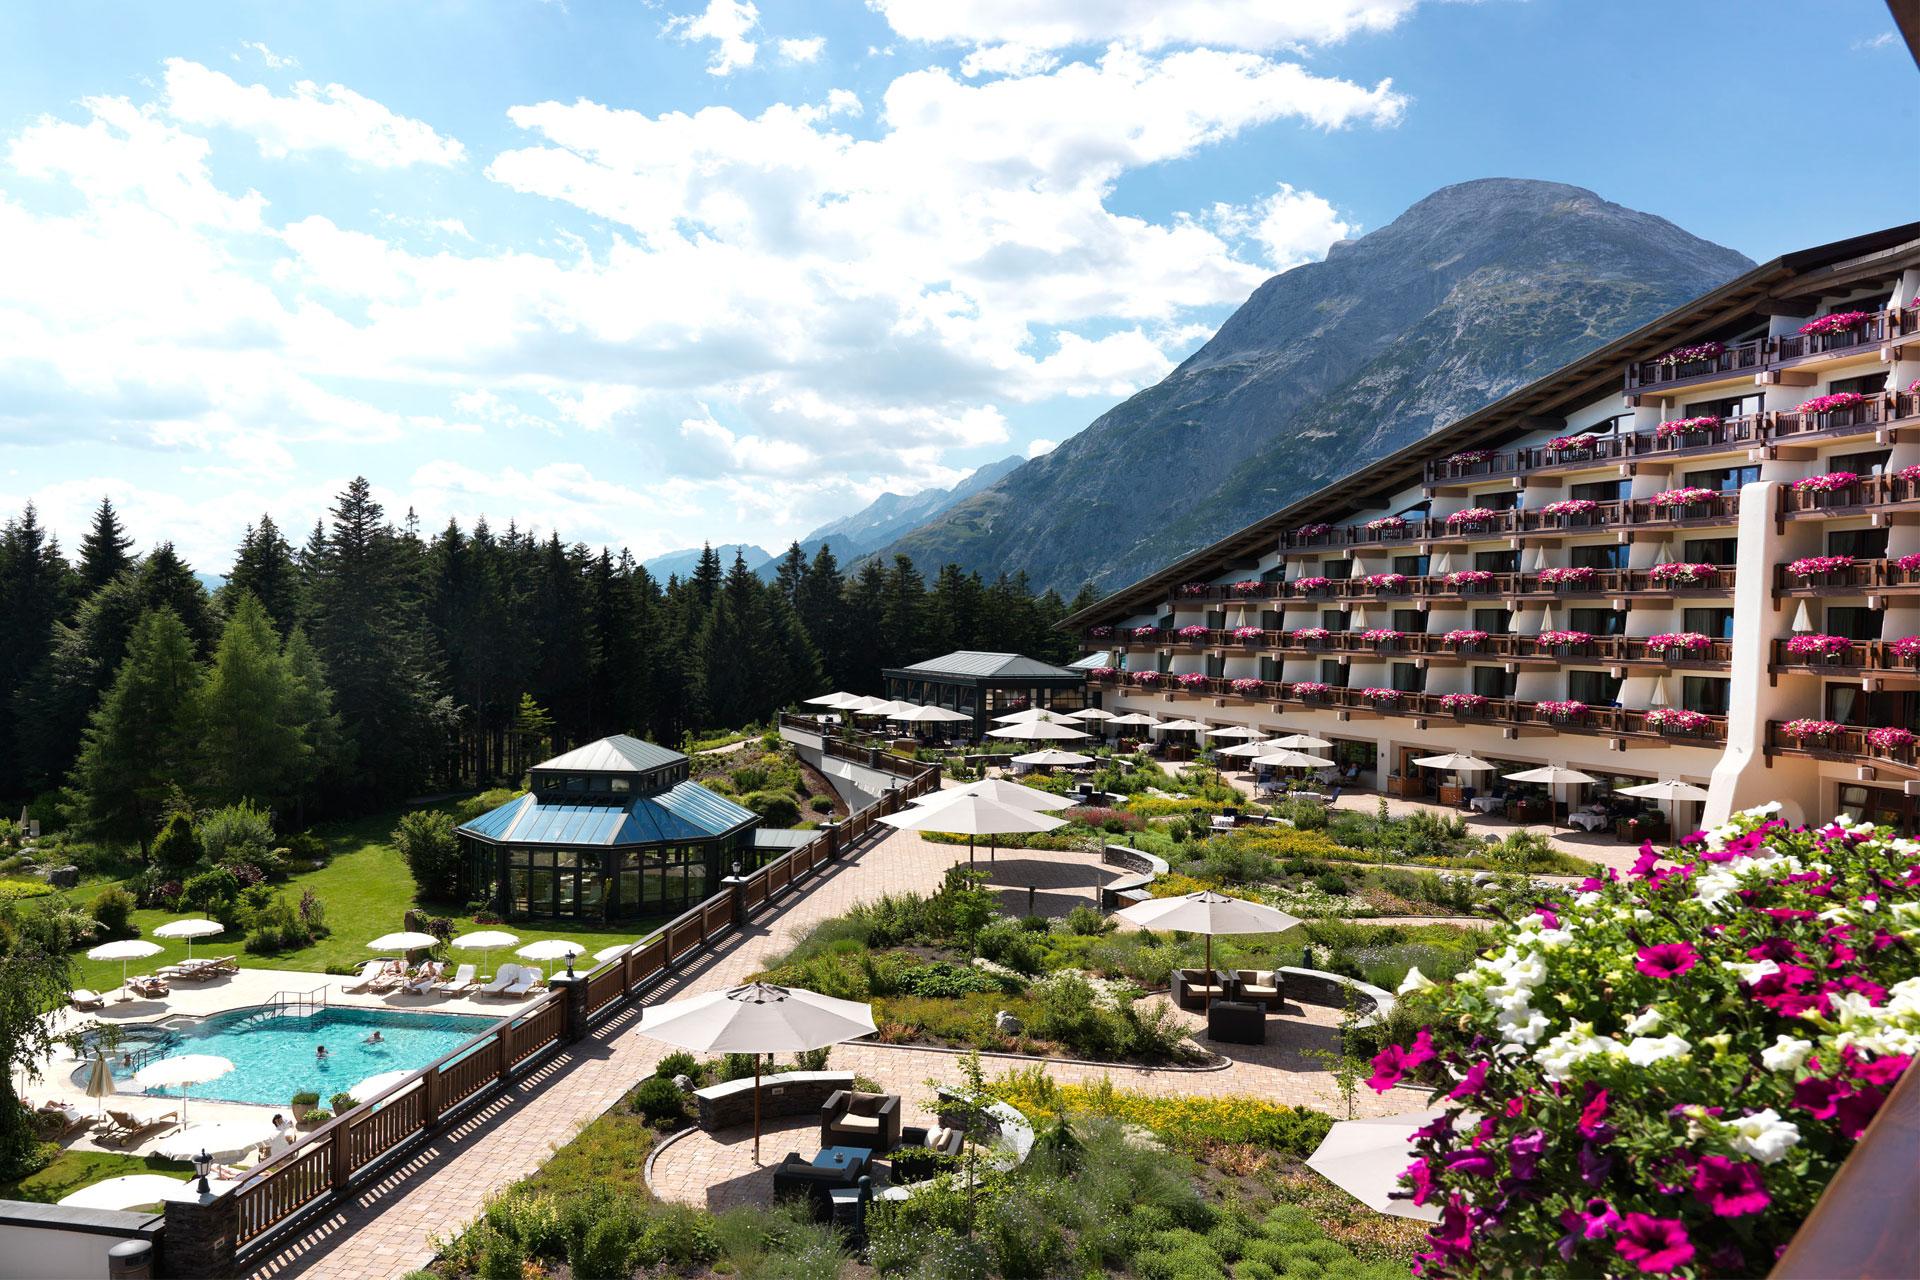 Exterior view of Interalpen-Hotel Tyrol.